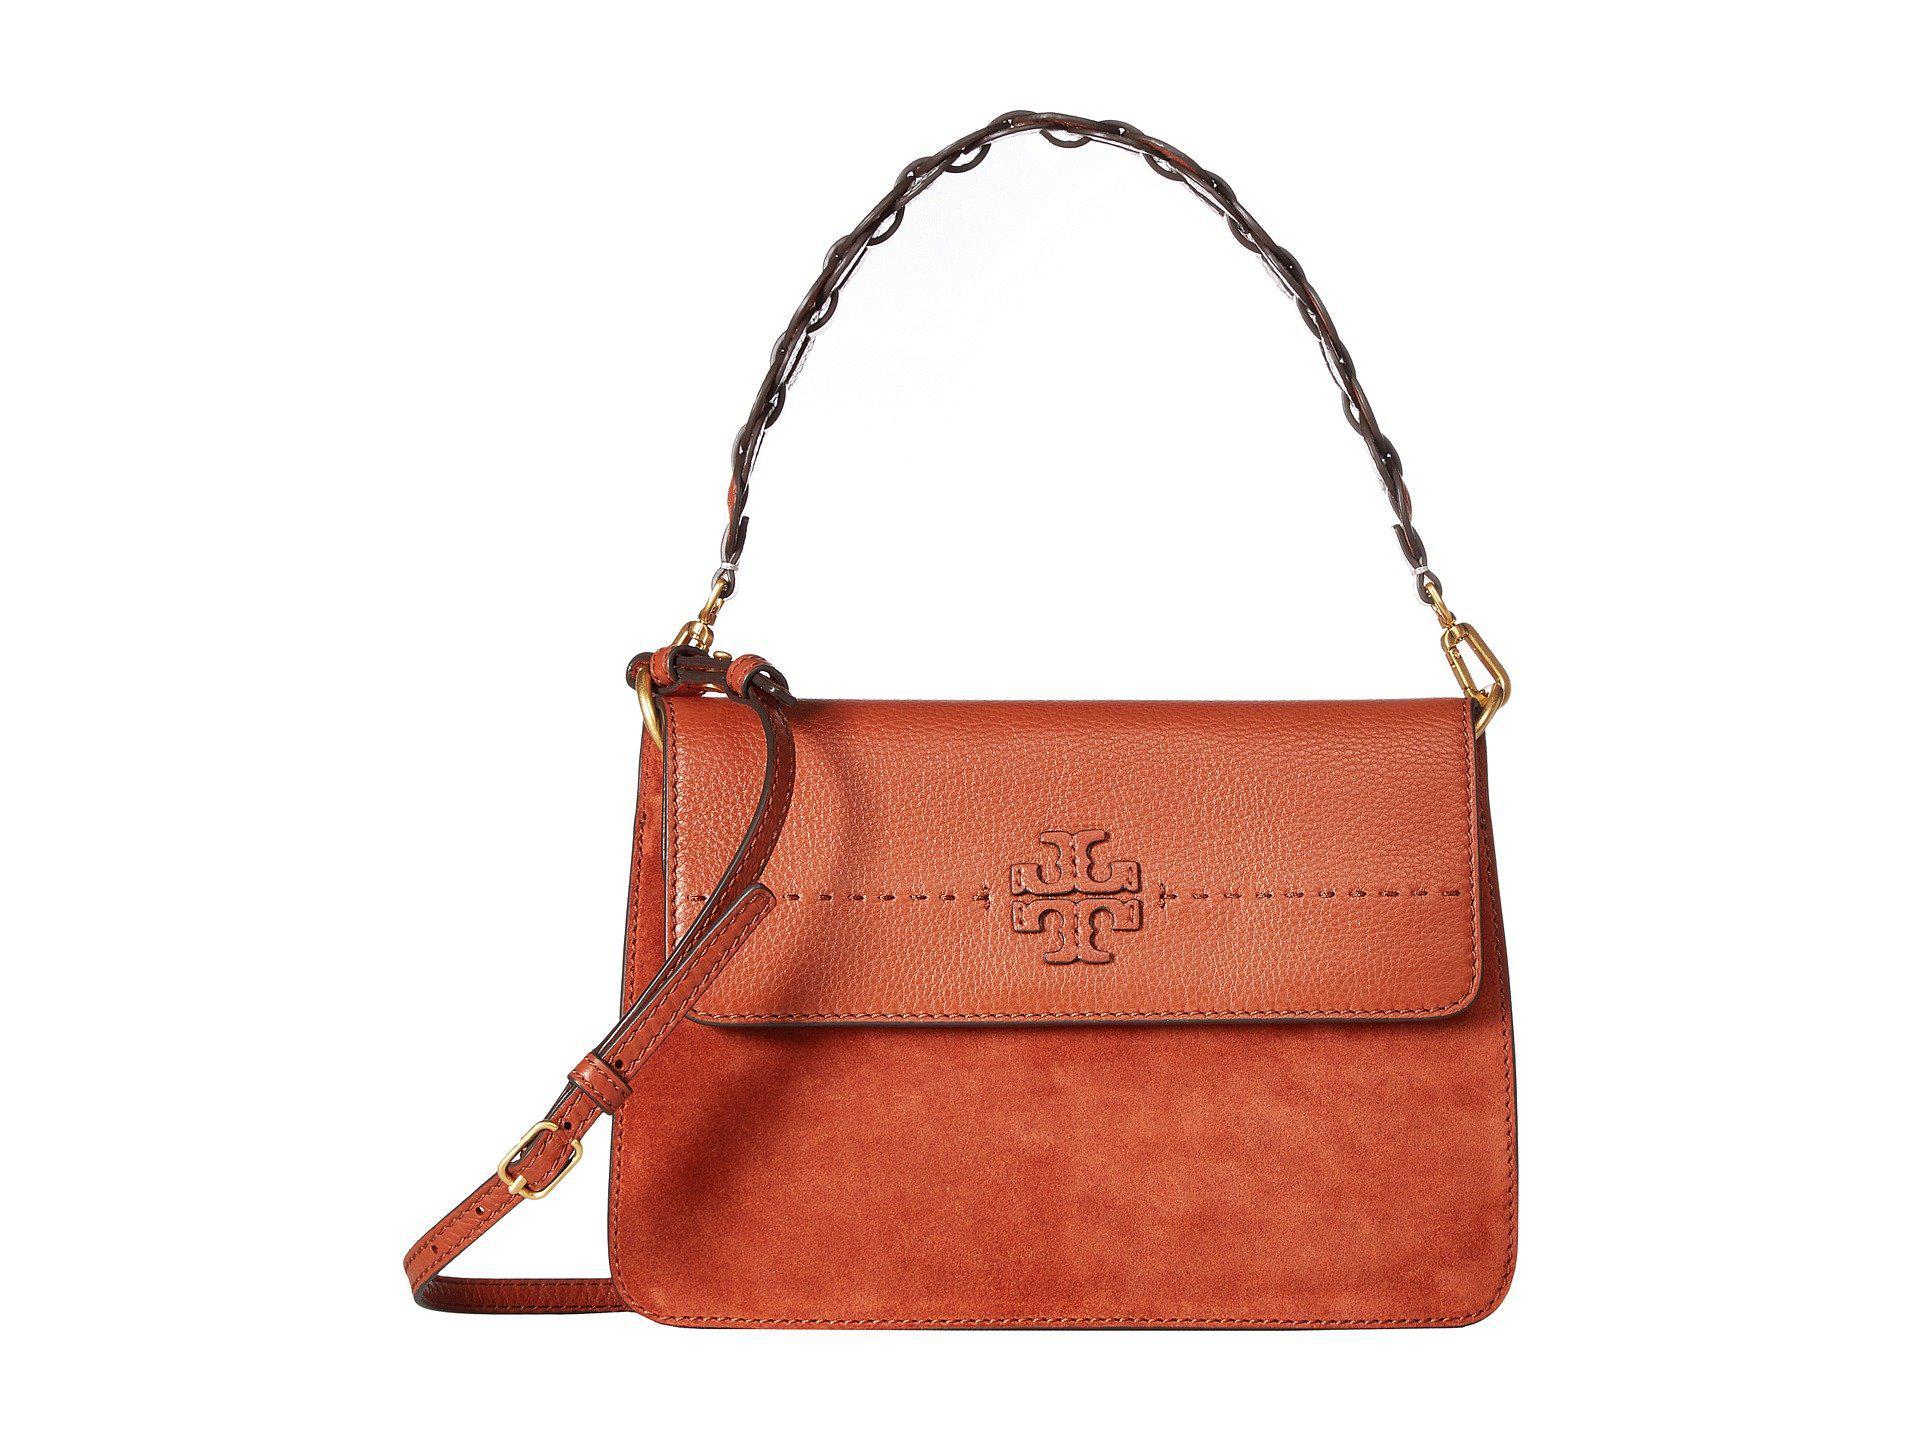 2f5b593dfb8c0 Lyst - Tory Burch Mcgraw Mixed Strap Shoulder Bag